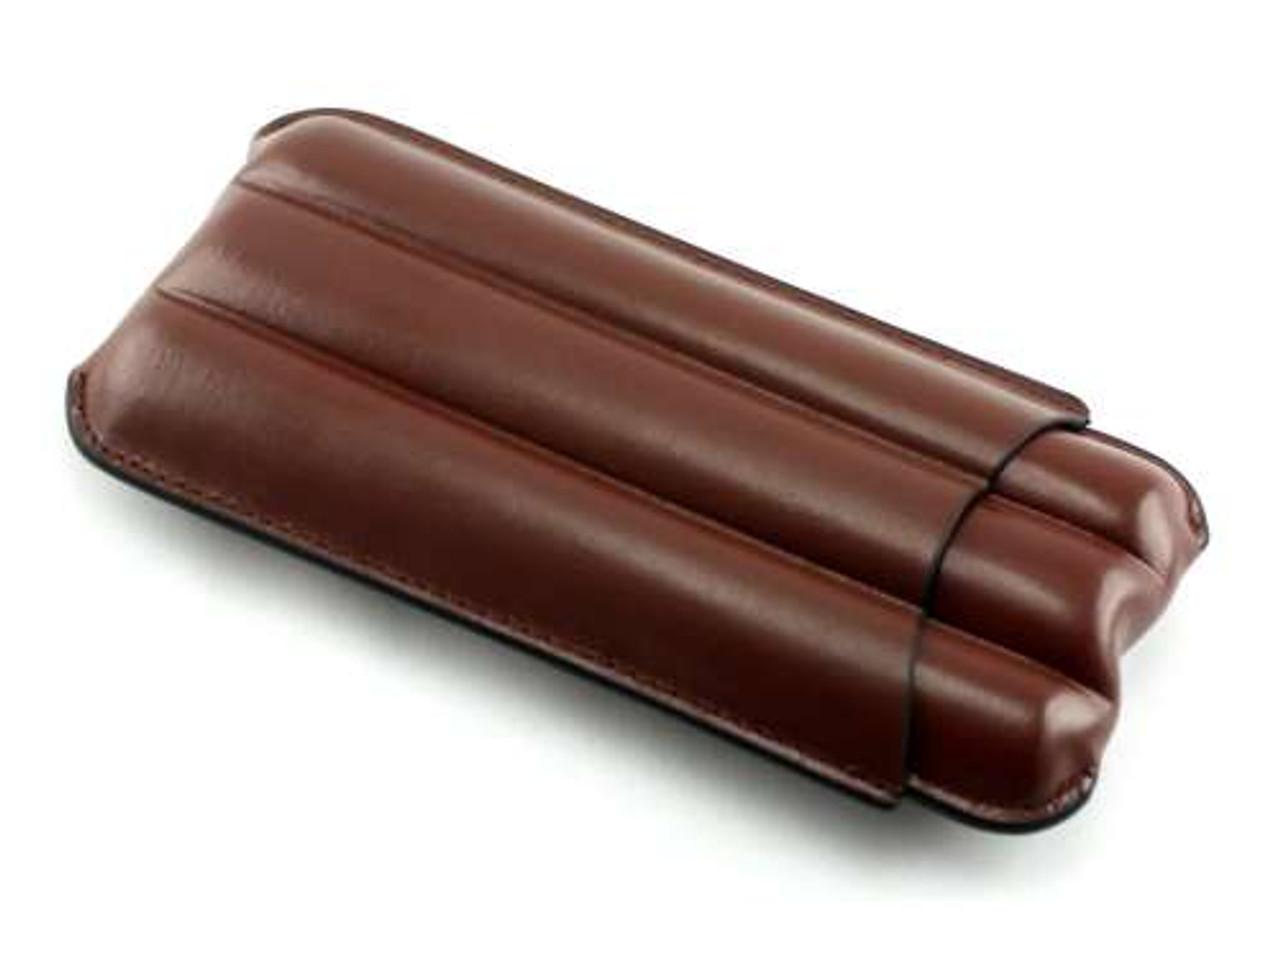 Brown Lawson Cigar Case